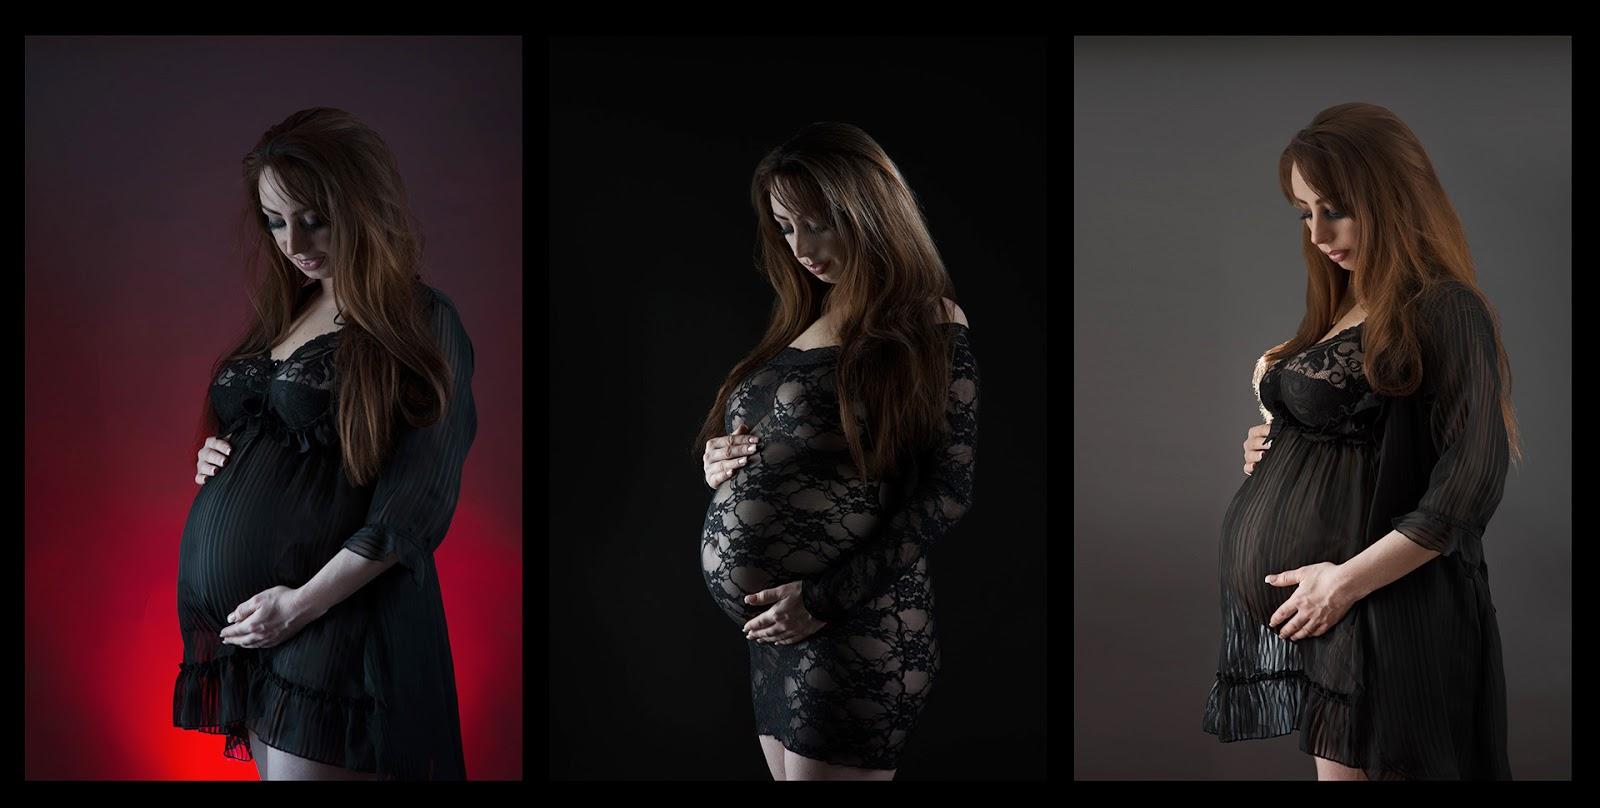 Maternity Pregnancy pregnant strobes off camera flash grey seemless backdrop back light low key high contrast Lee Ramsden